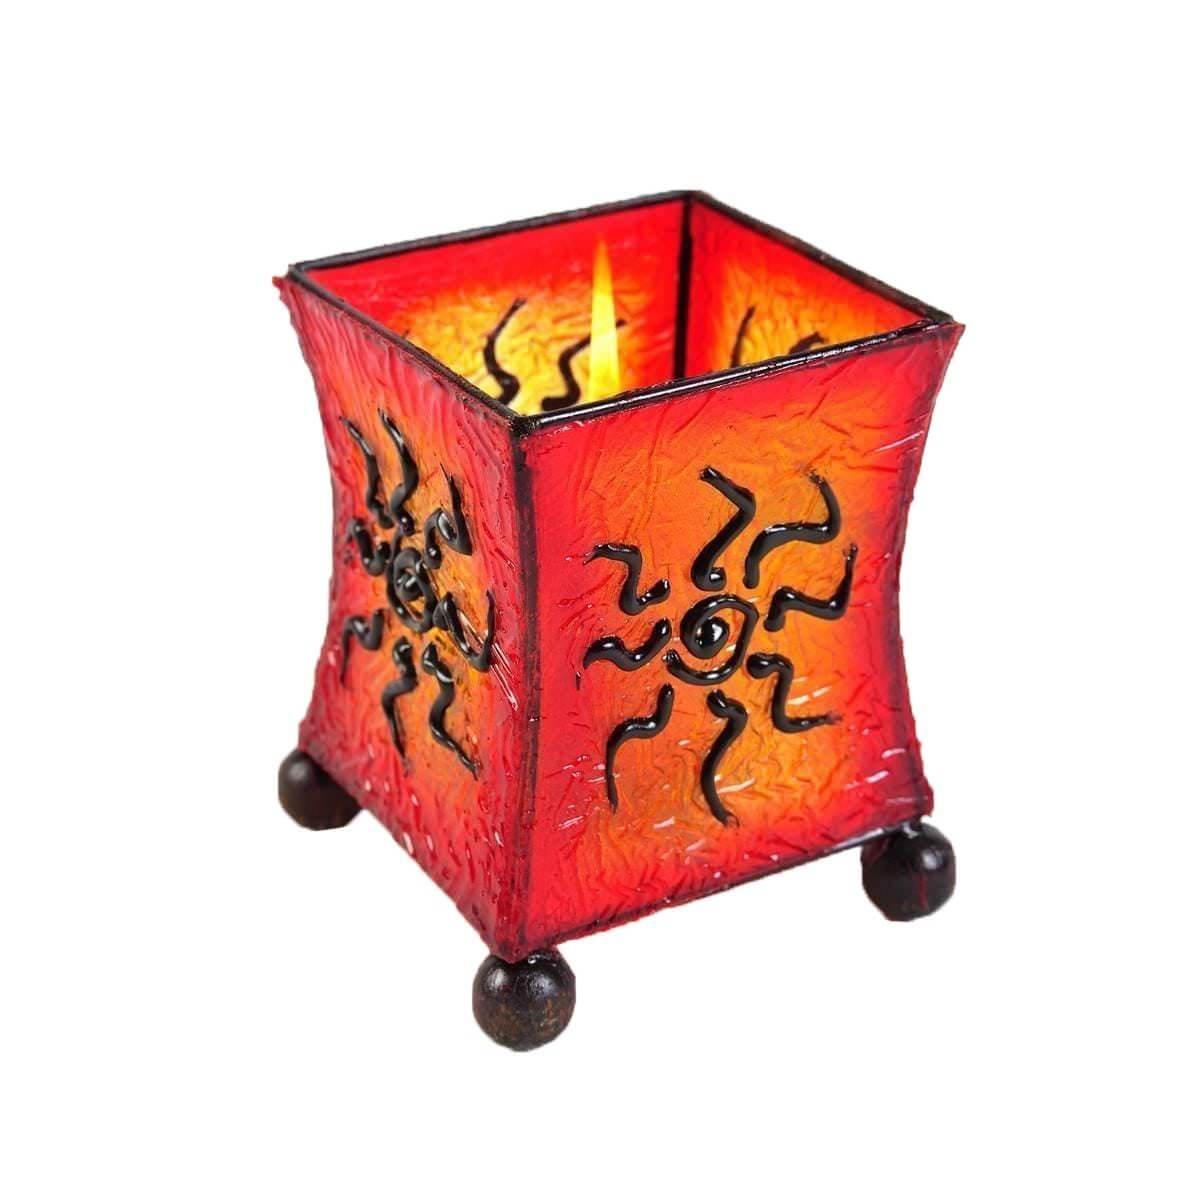 Windlicht teelicht teelichthalter kerzenhalter deko resin for Deko lampen bali